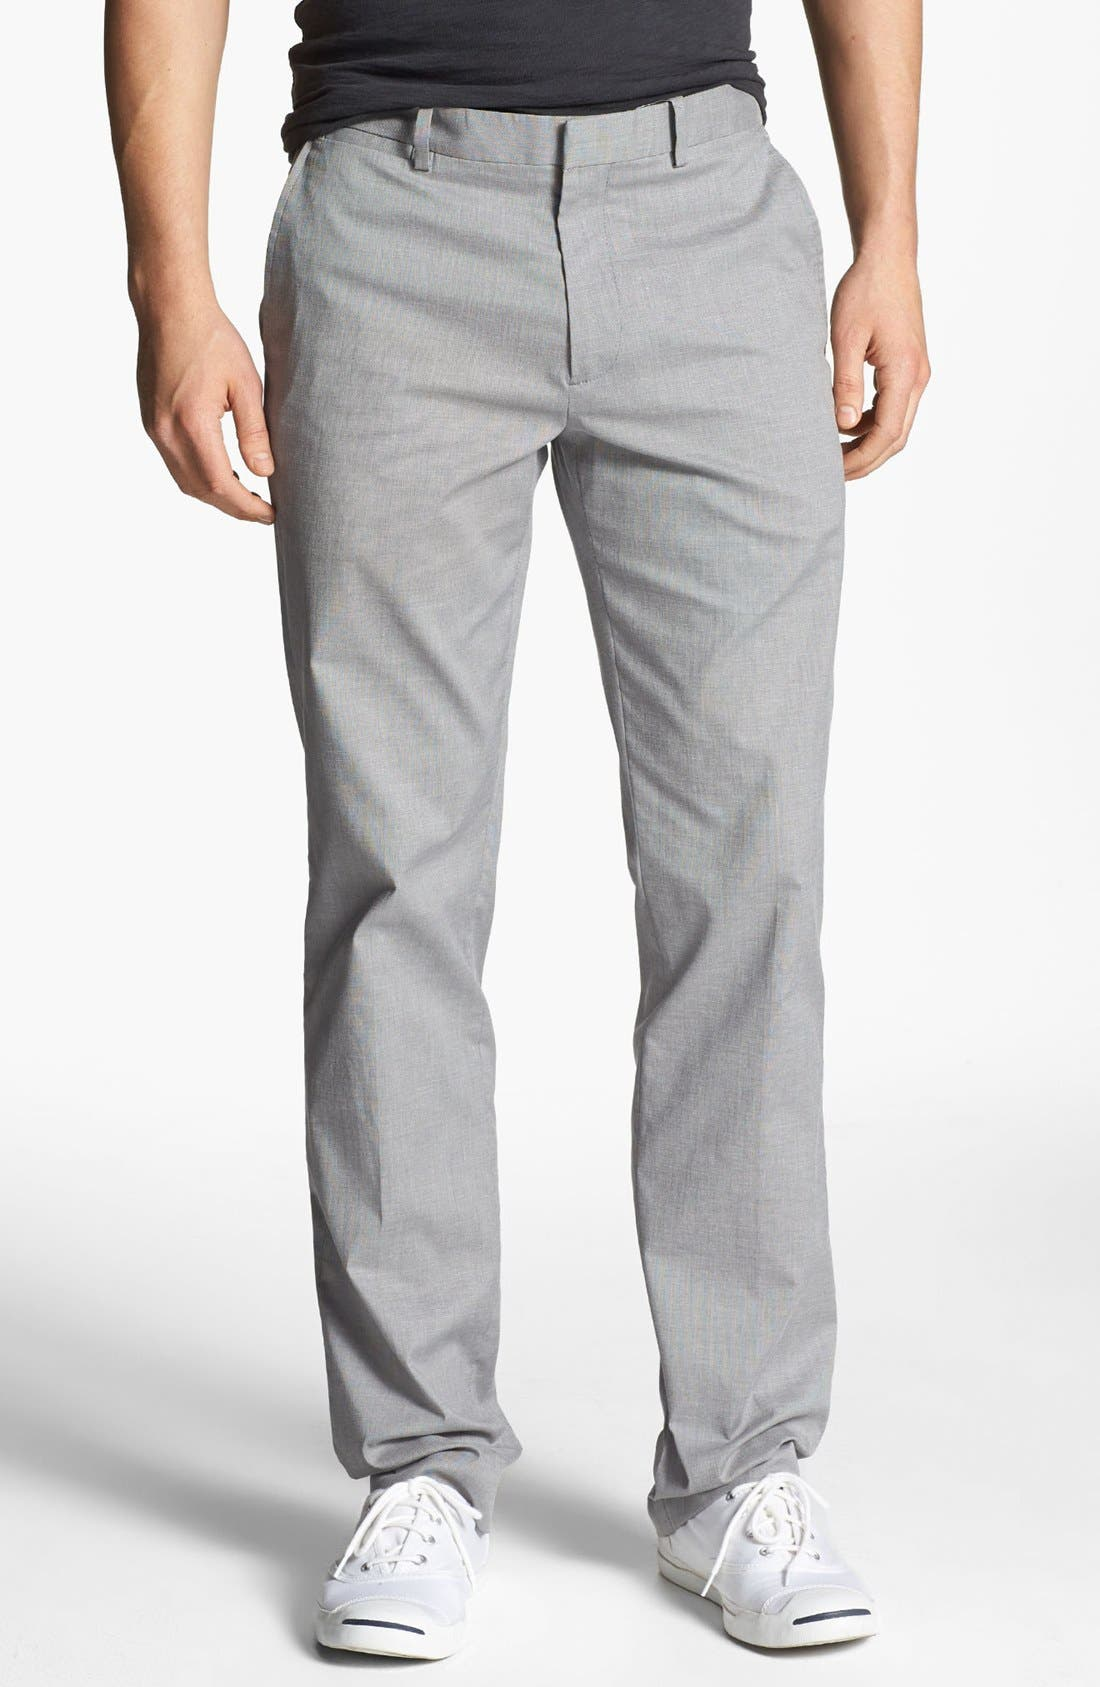 Alternate Image 1 Selected - Theory 'Marlo Diria' Slim Fit Pants